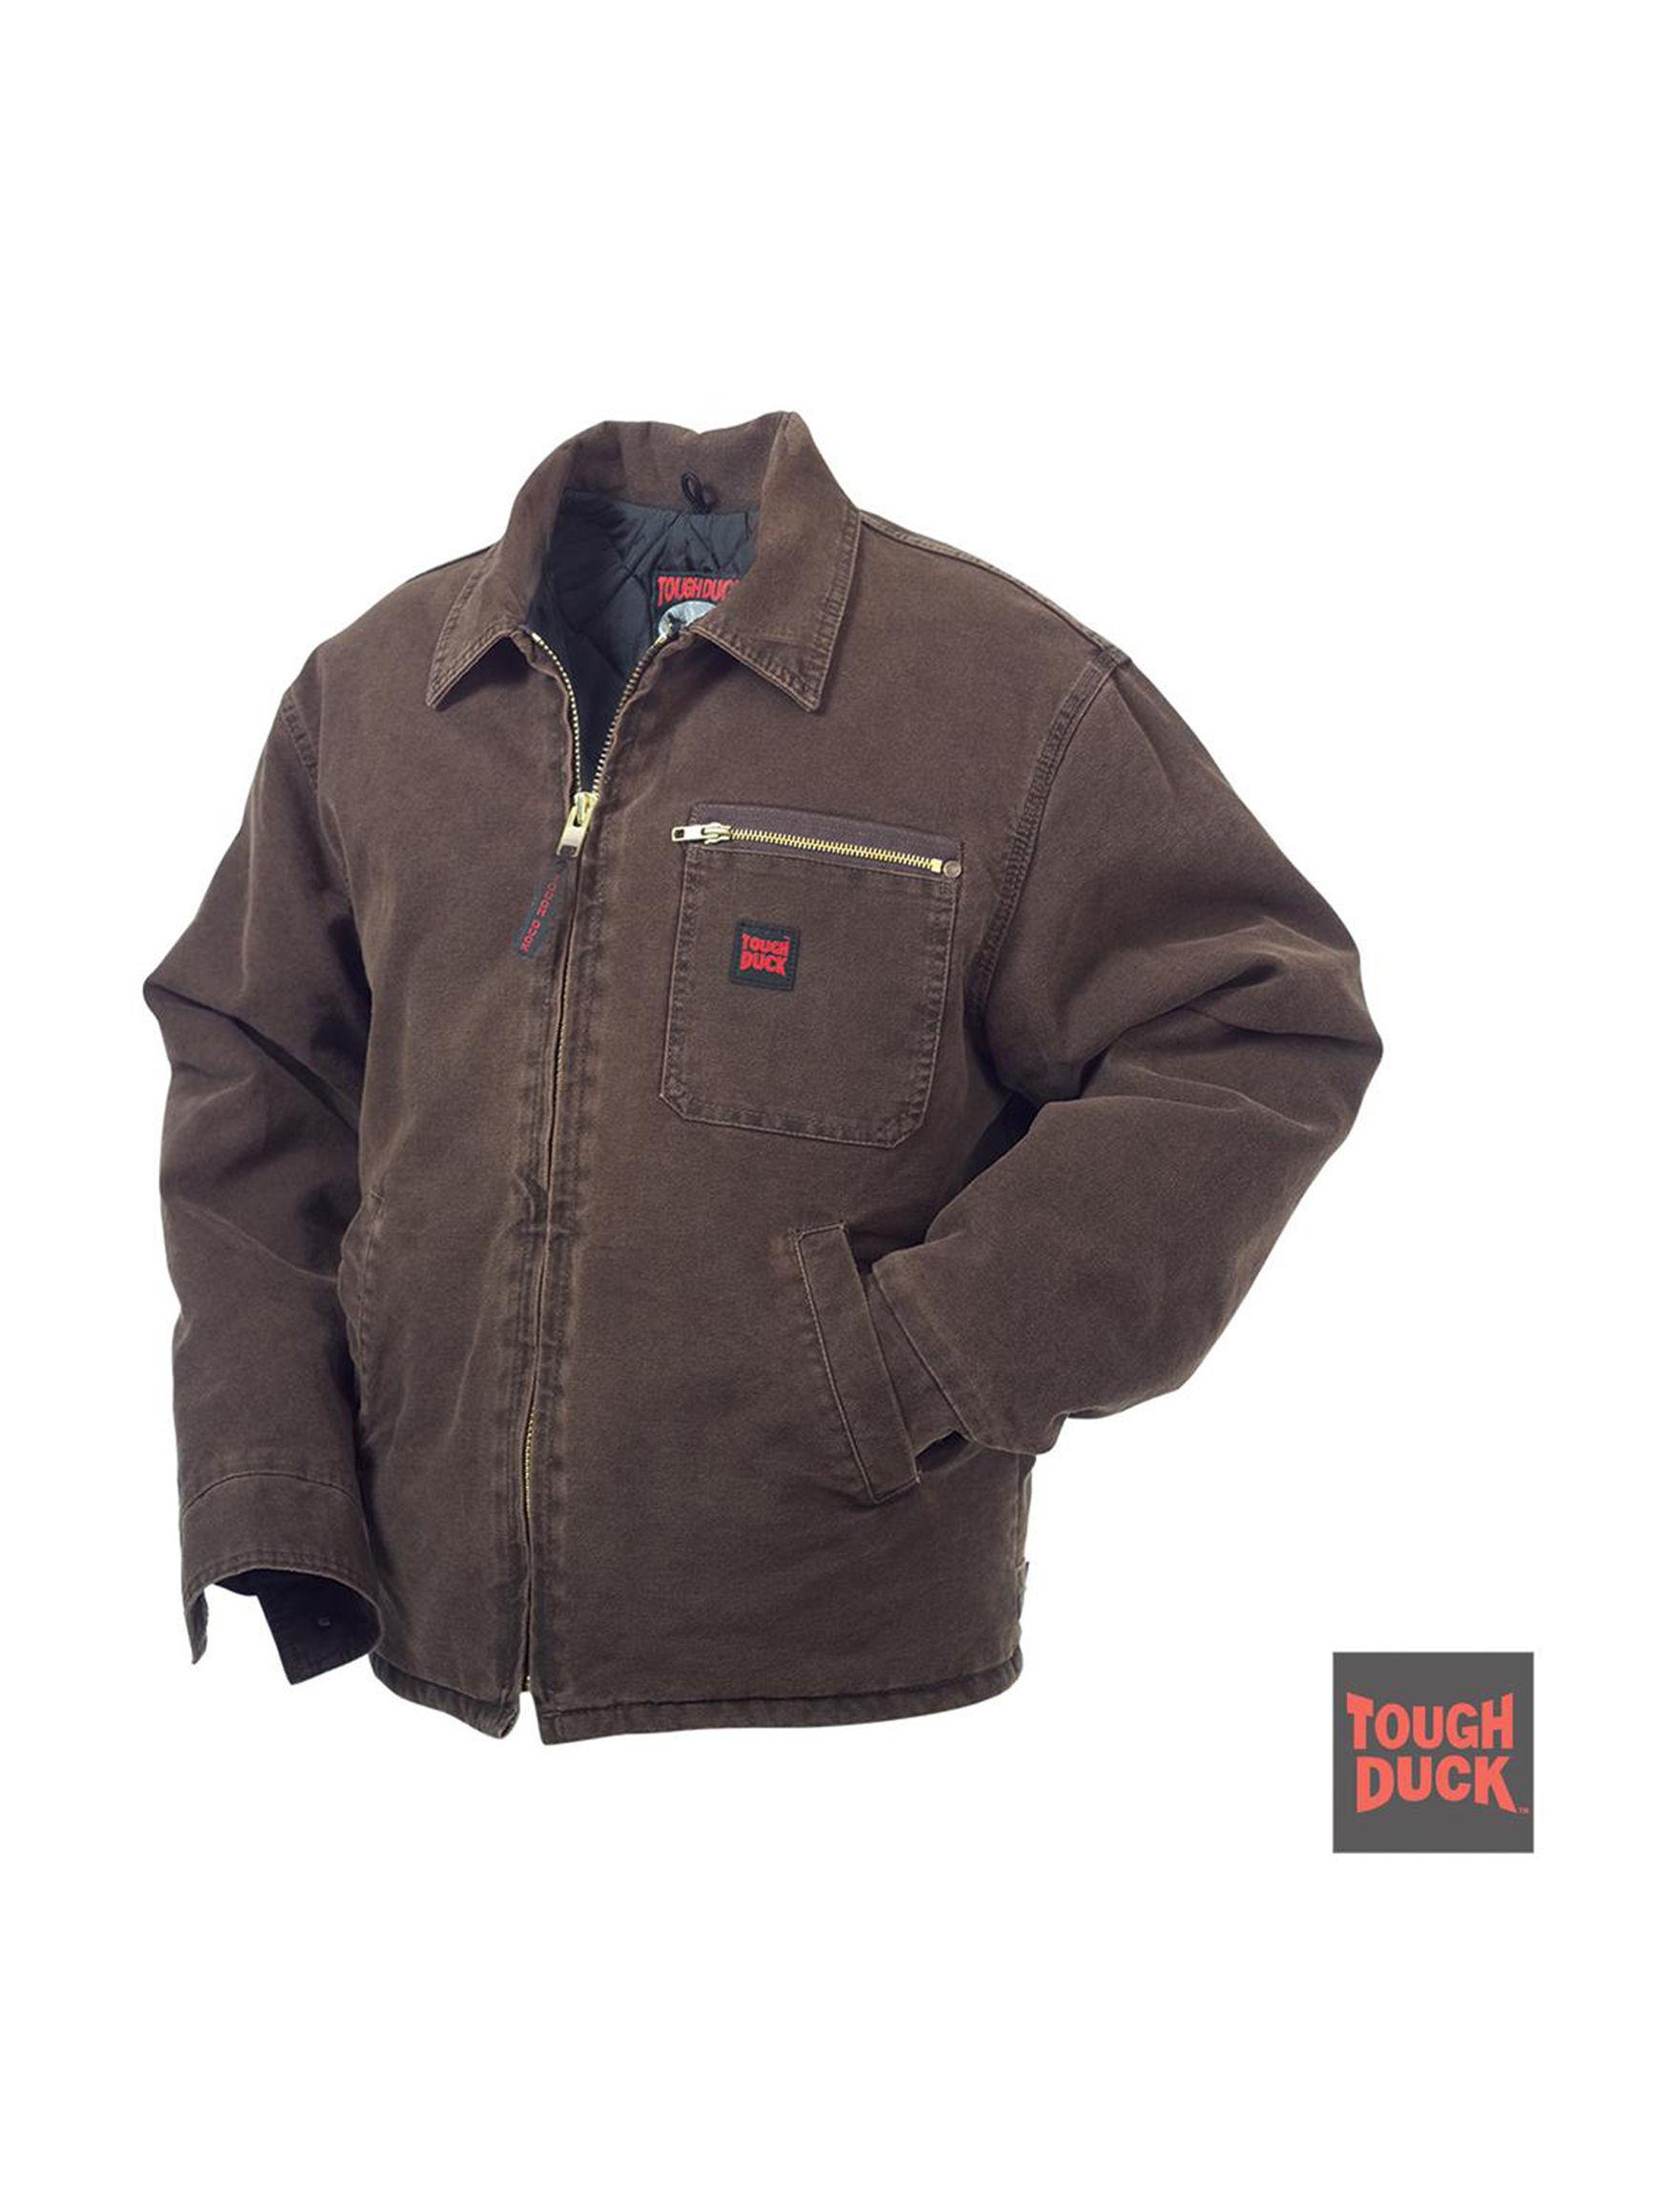 Tough Duck Chestnut Insulated Jackets